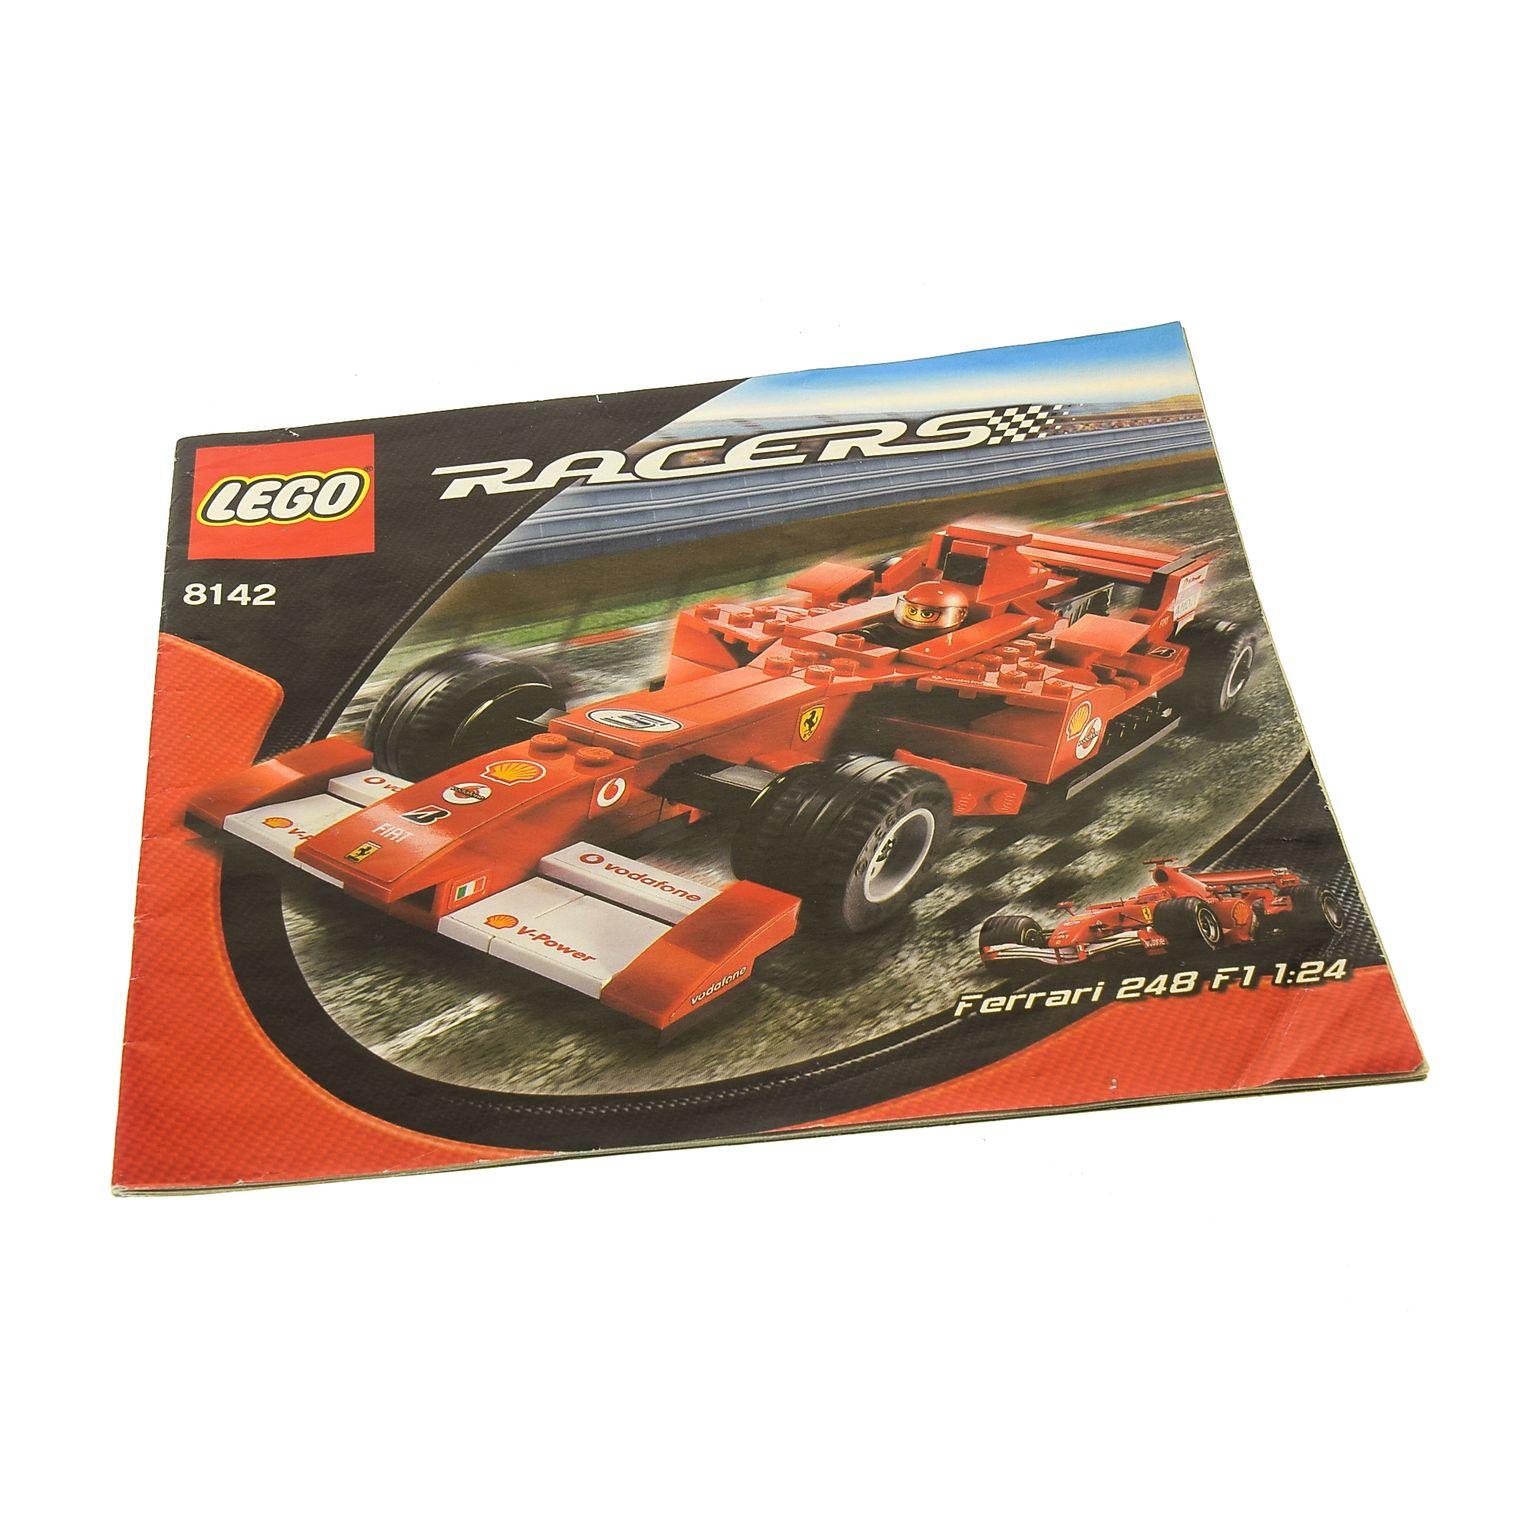 LEGO/DUPLO Spezialist | 1 x Lego brick System Instructions Racers Ferrari  248 F1 1:24 Vodafone version Booklet 8142